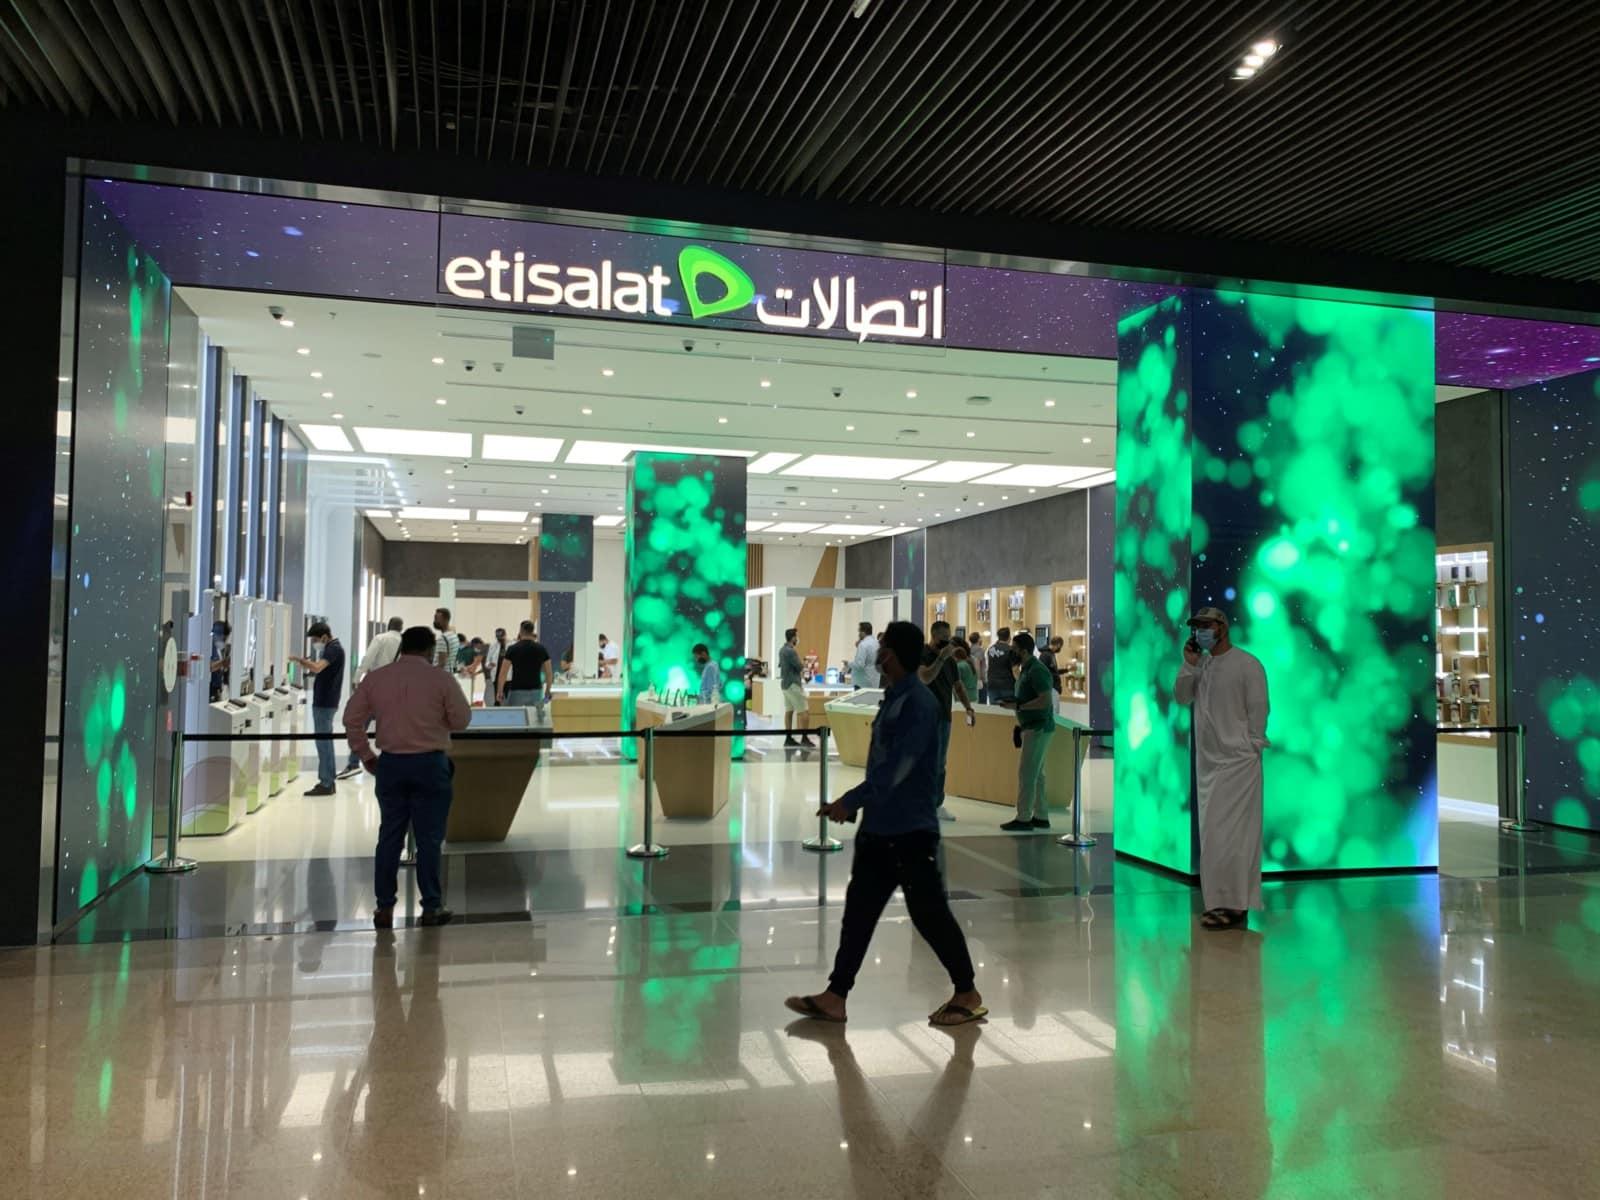 Etisalat - Concept Store Dubai Mall